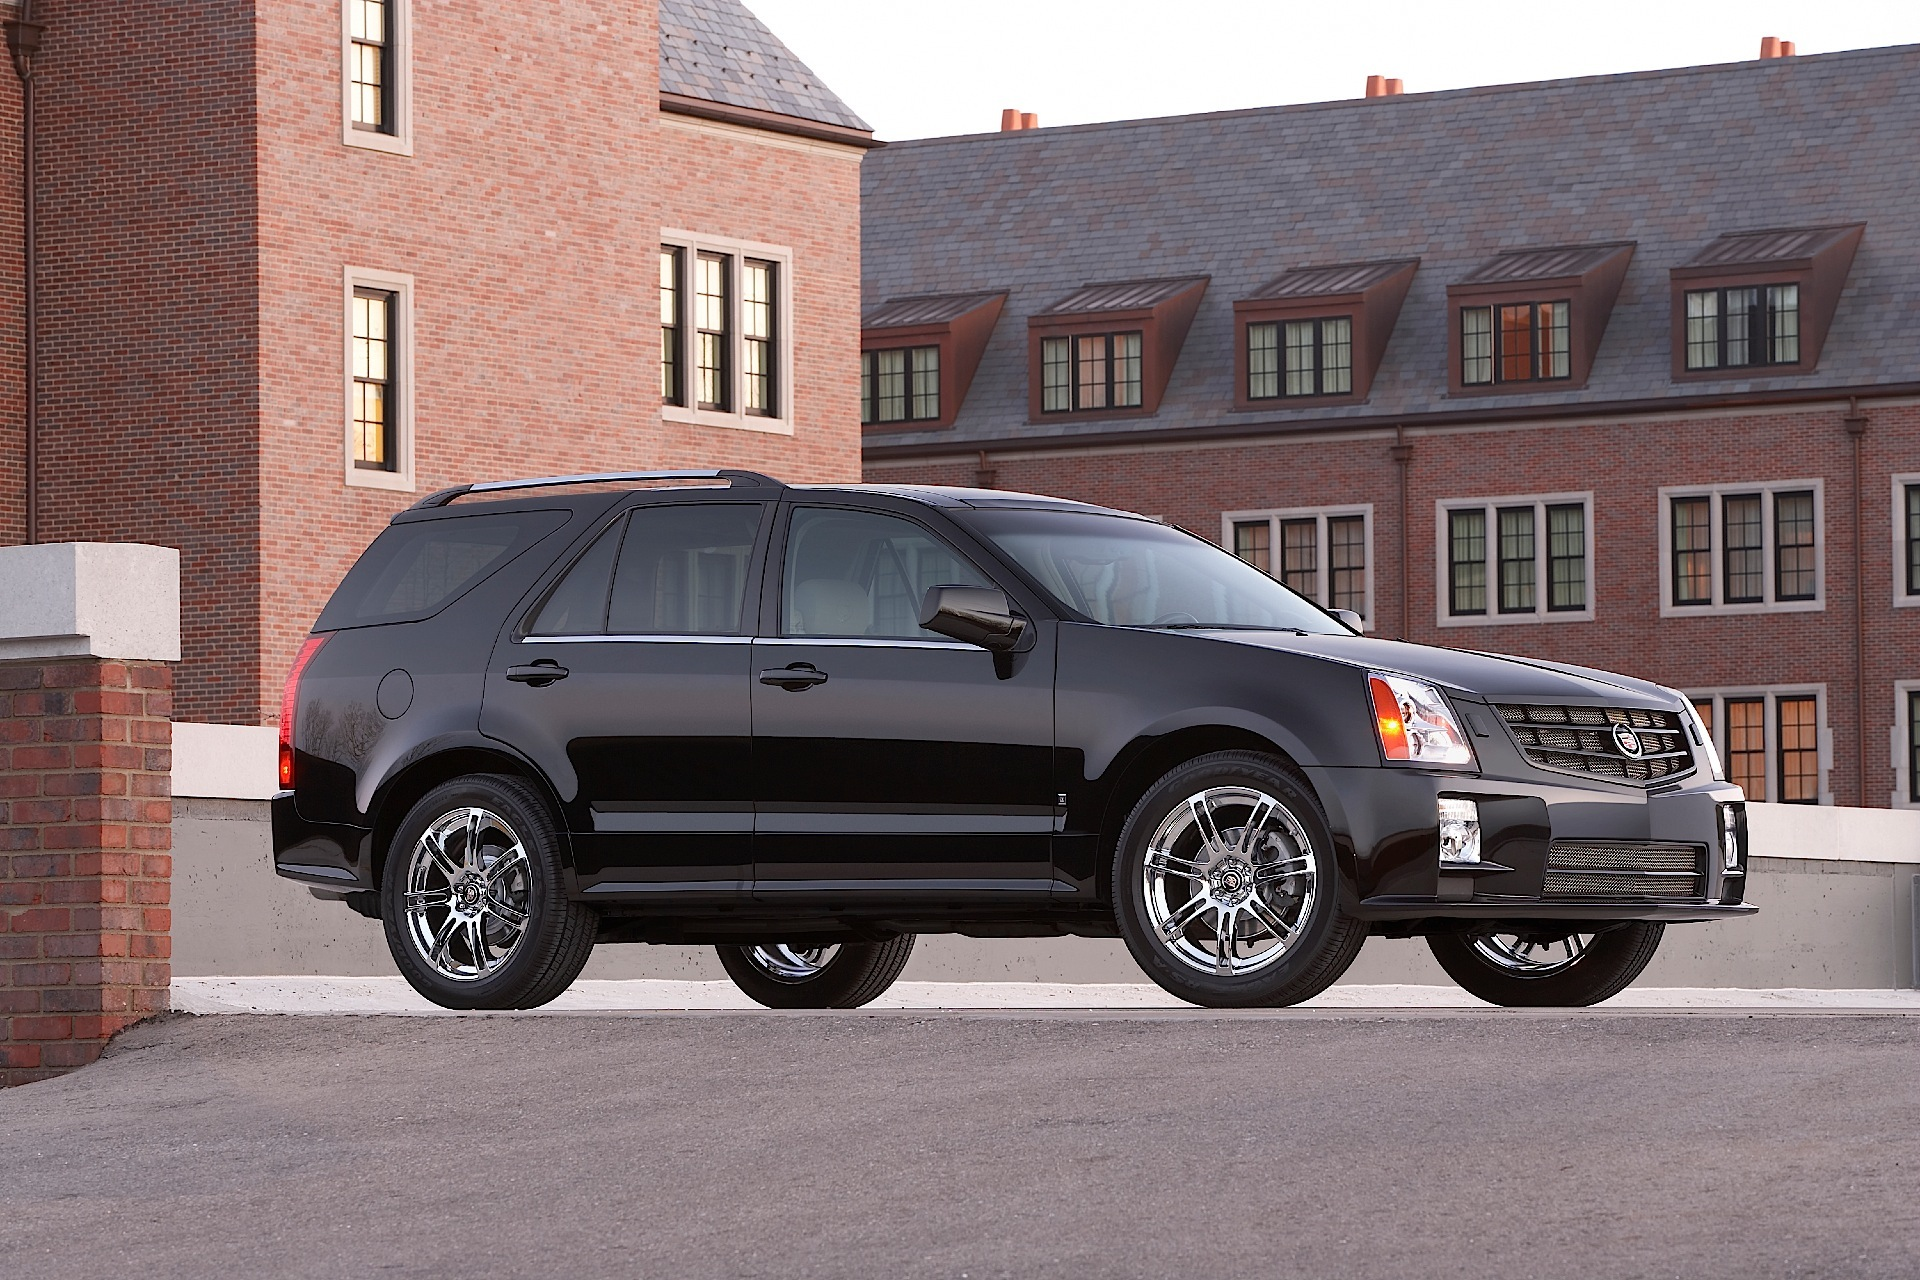 Superior Buick Gmc >> CADILLAC SRX - 2005, 2006, 2007, 2008, 2009, 2010, 2011, 2012, 2013, 2014, 2015, 2016, 2017 ...